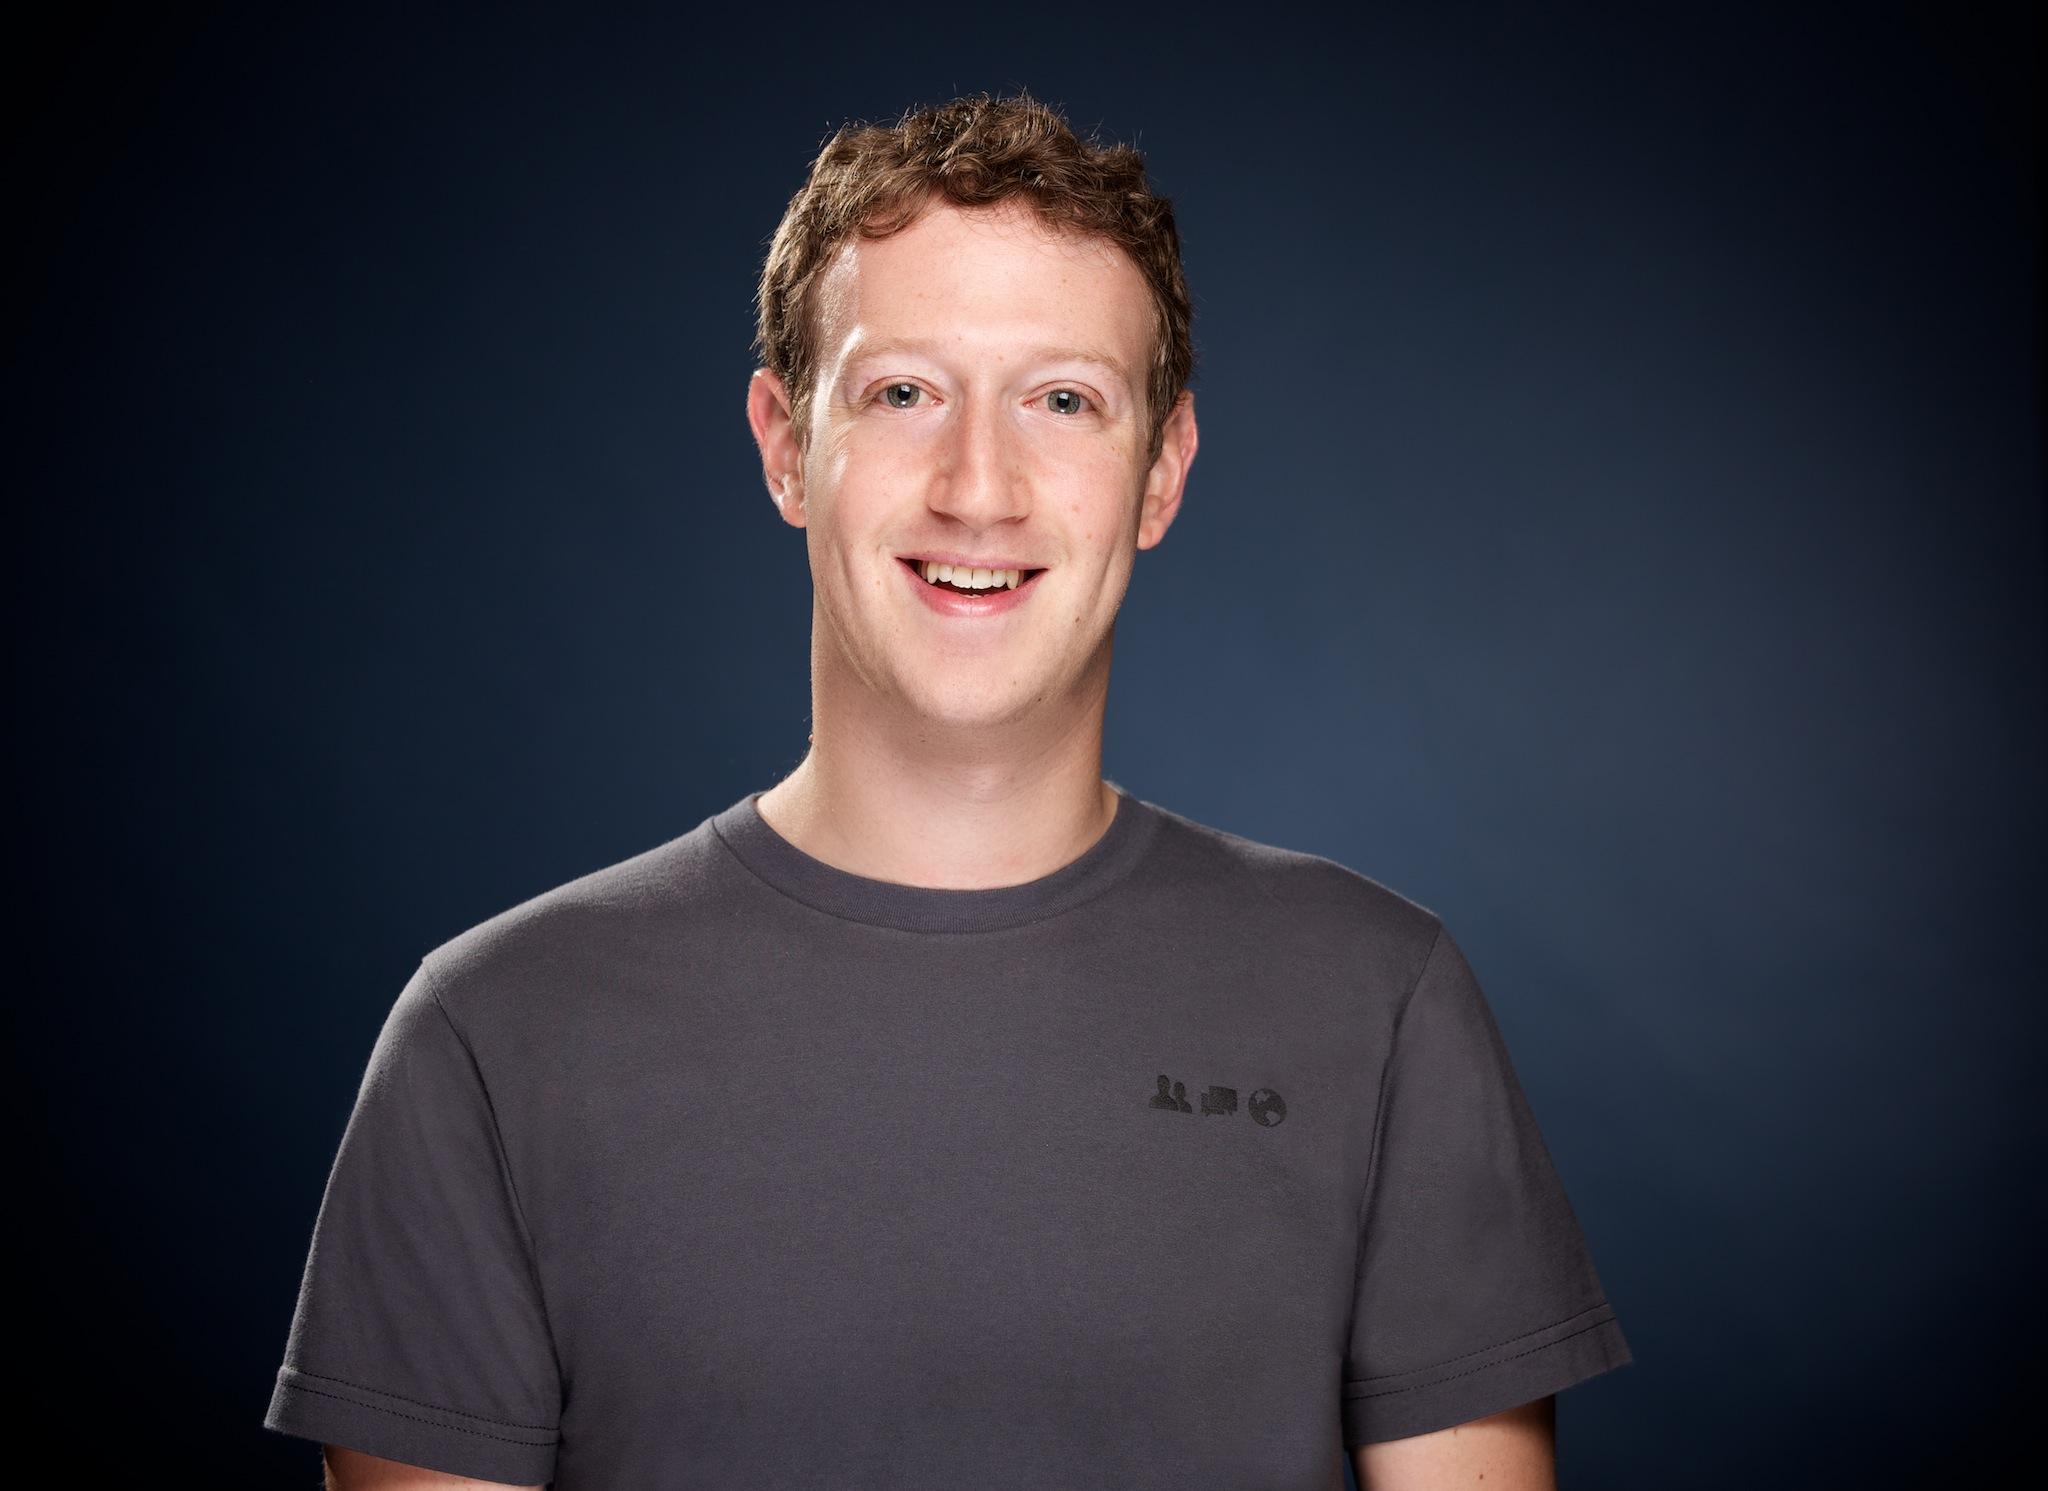 Hackean cuentas de Twitter y Pinterest de Mark Zuckerberg